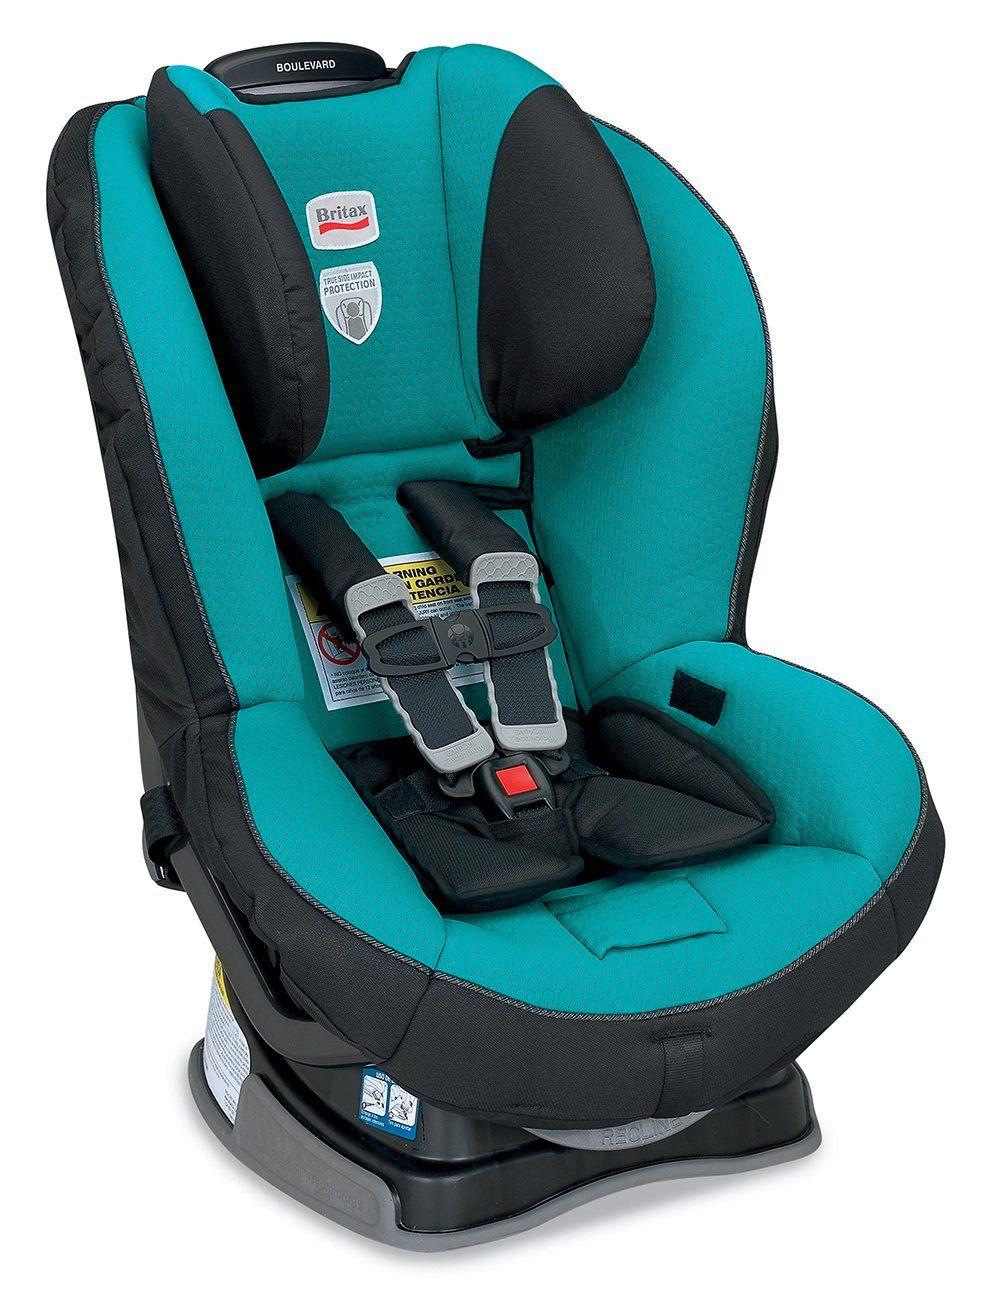 Britax Boulevard G4 Convertible Car Seat, Laguna Baby